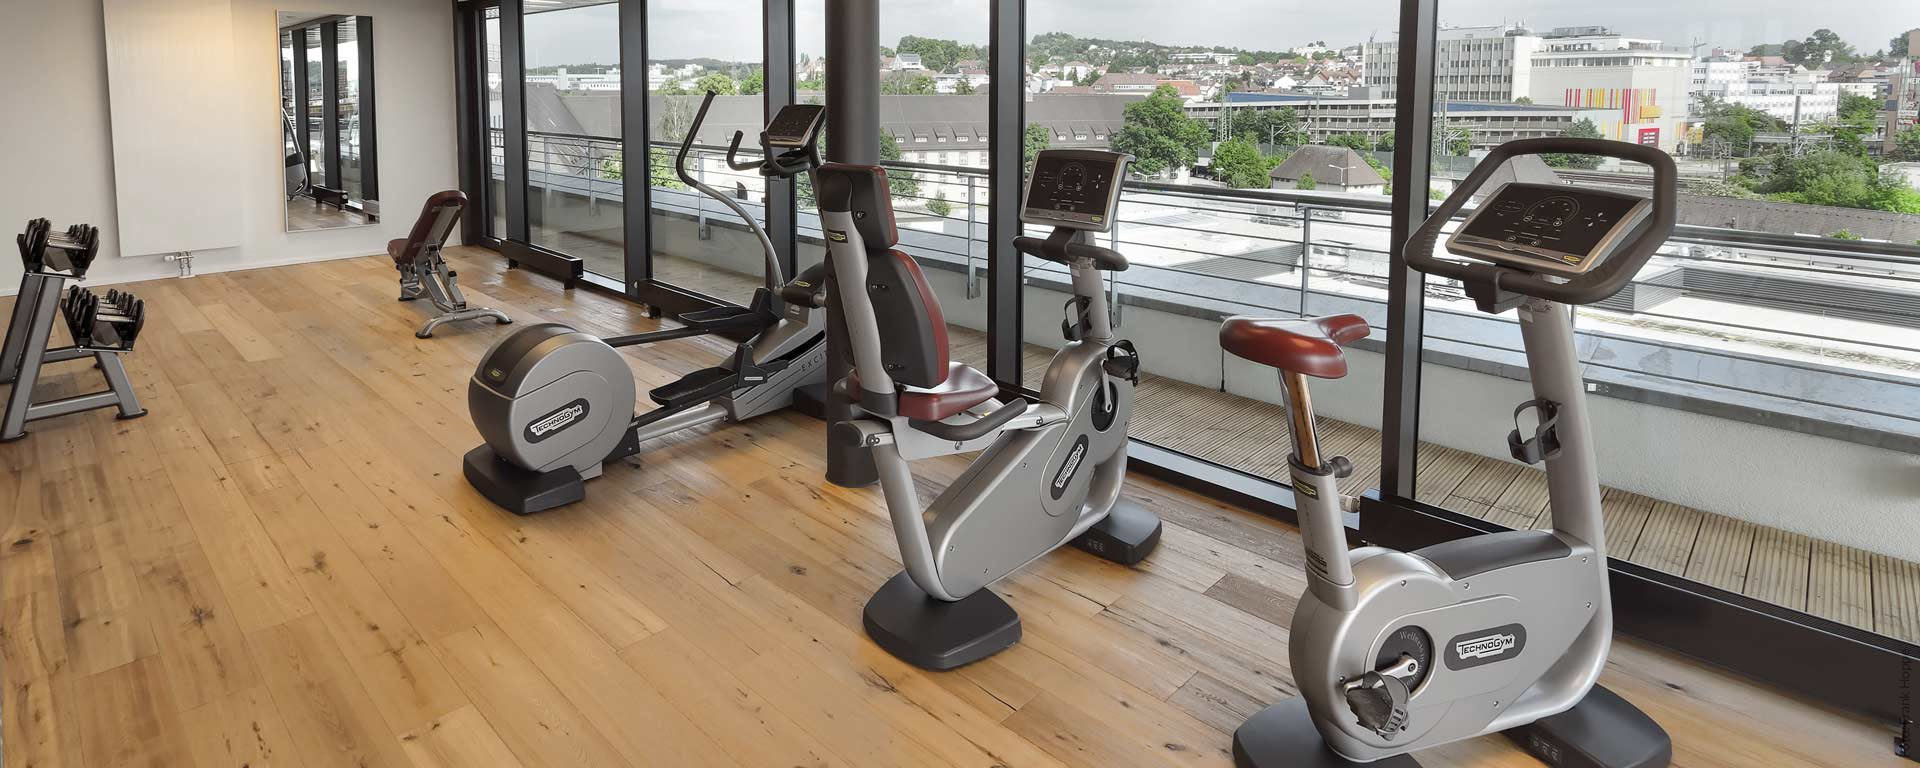 V8 HOTEL-Fitness-Bereich